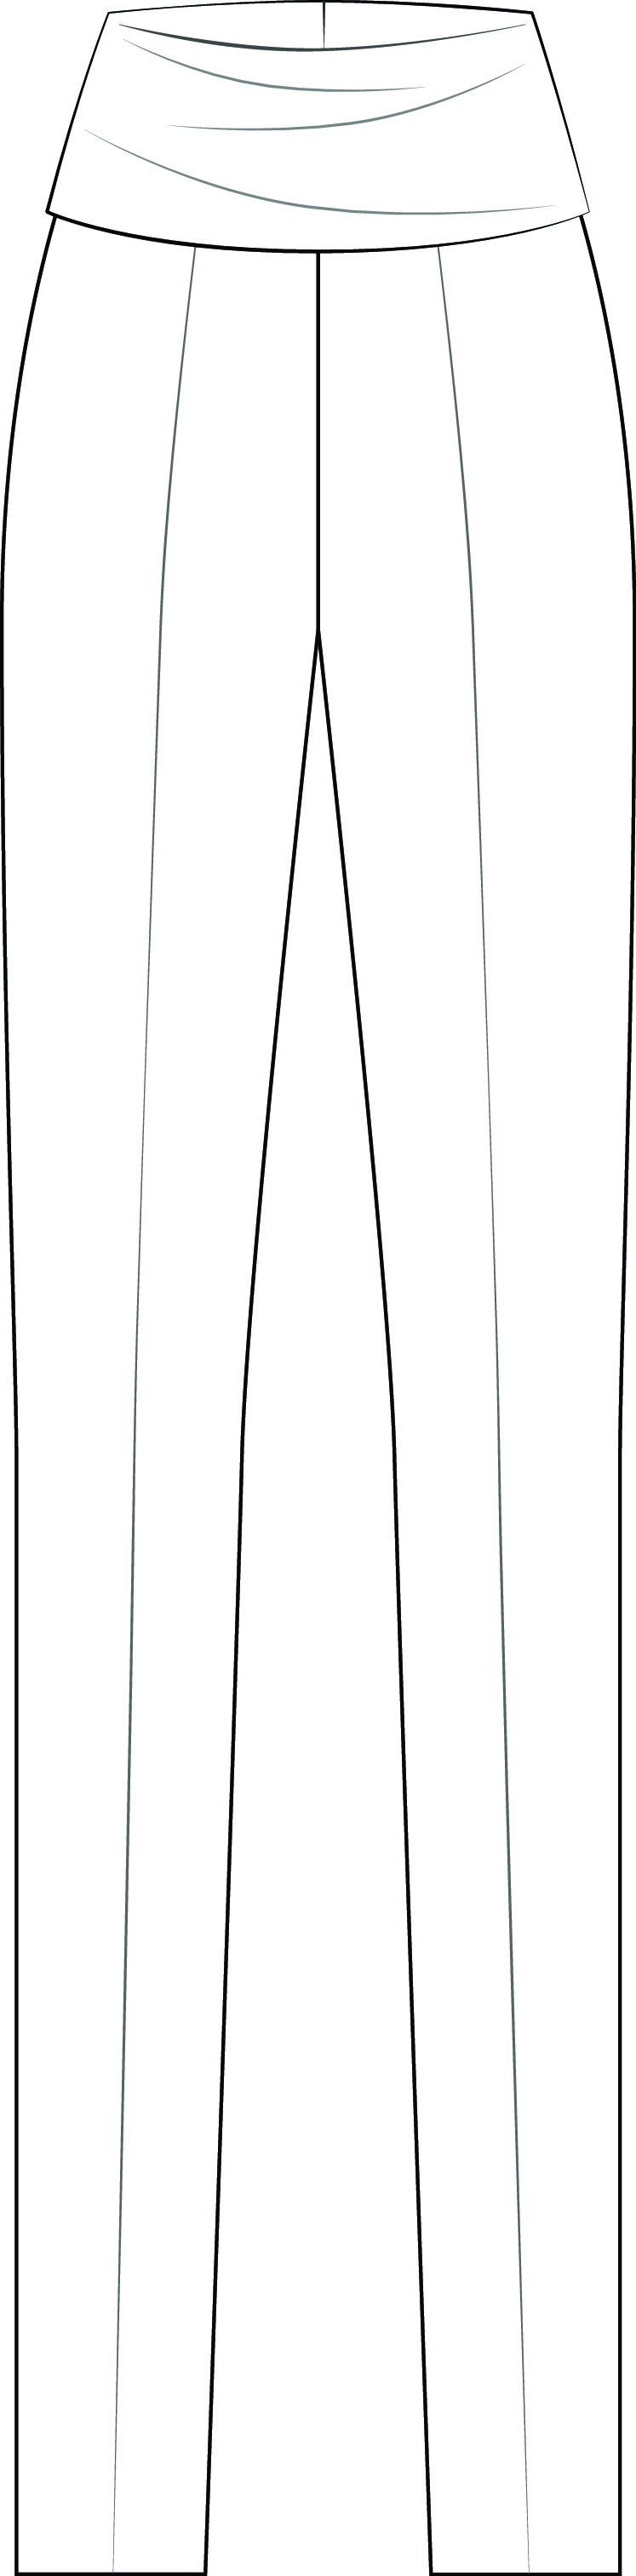 CJP_StudioCollection_Pants_Skinny.jpg